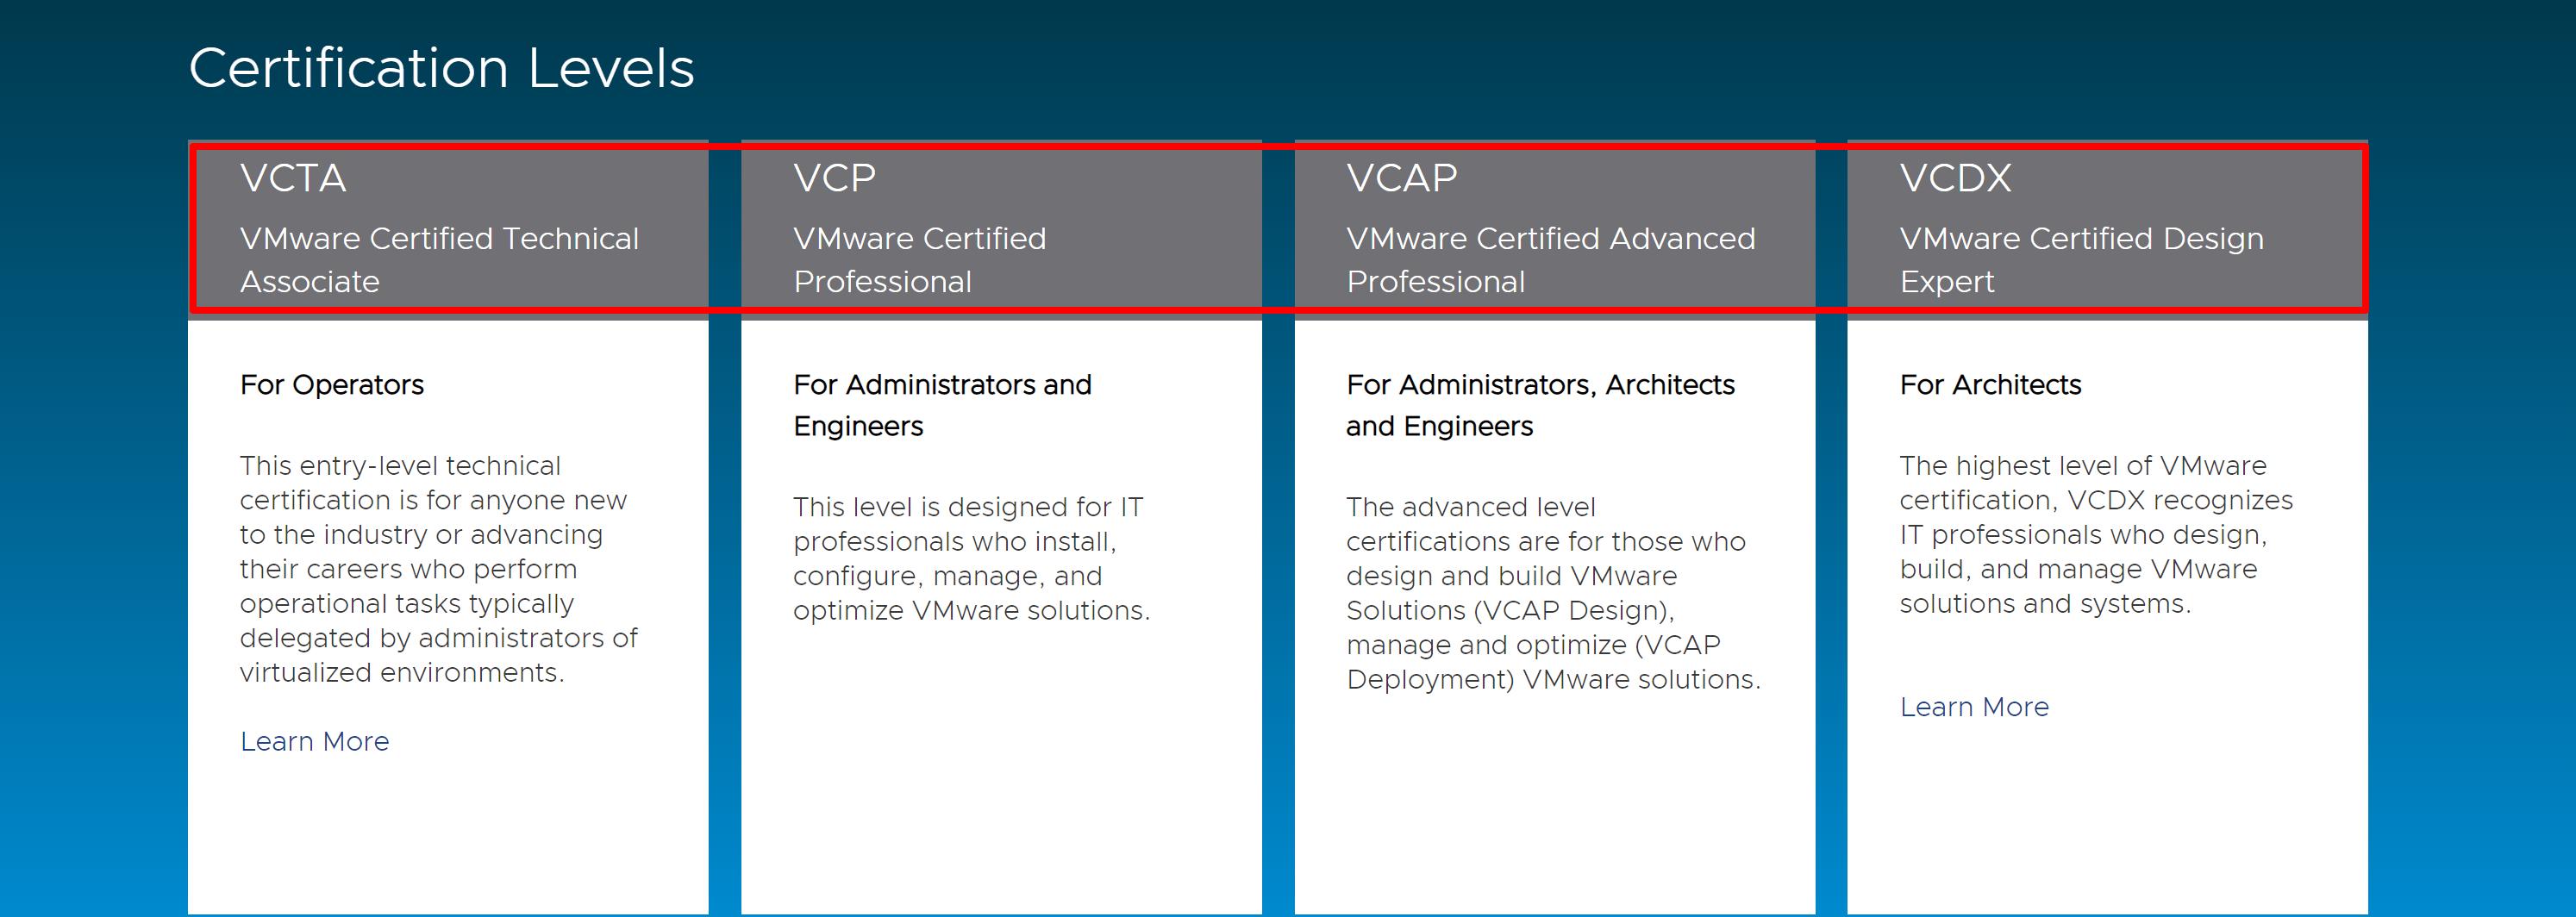 VMware ceretification levels- VMWare pricing